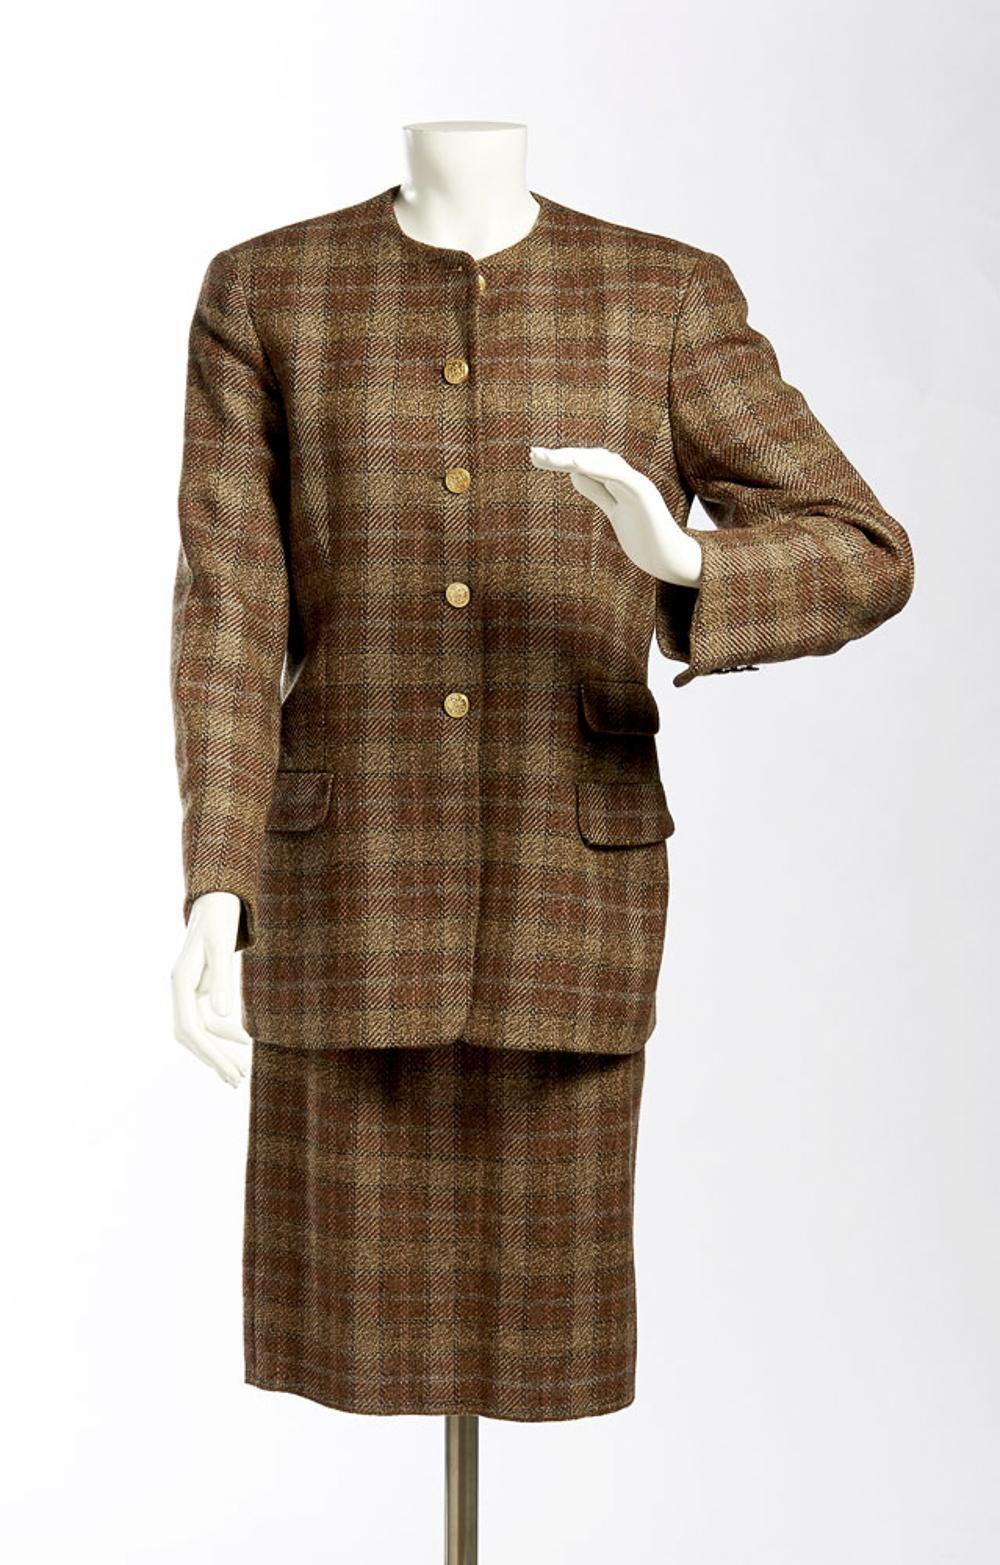 Salvatore Ferragamo, coat and skirt